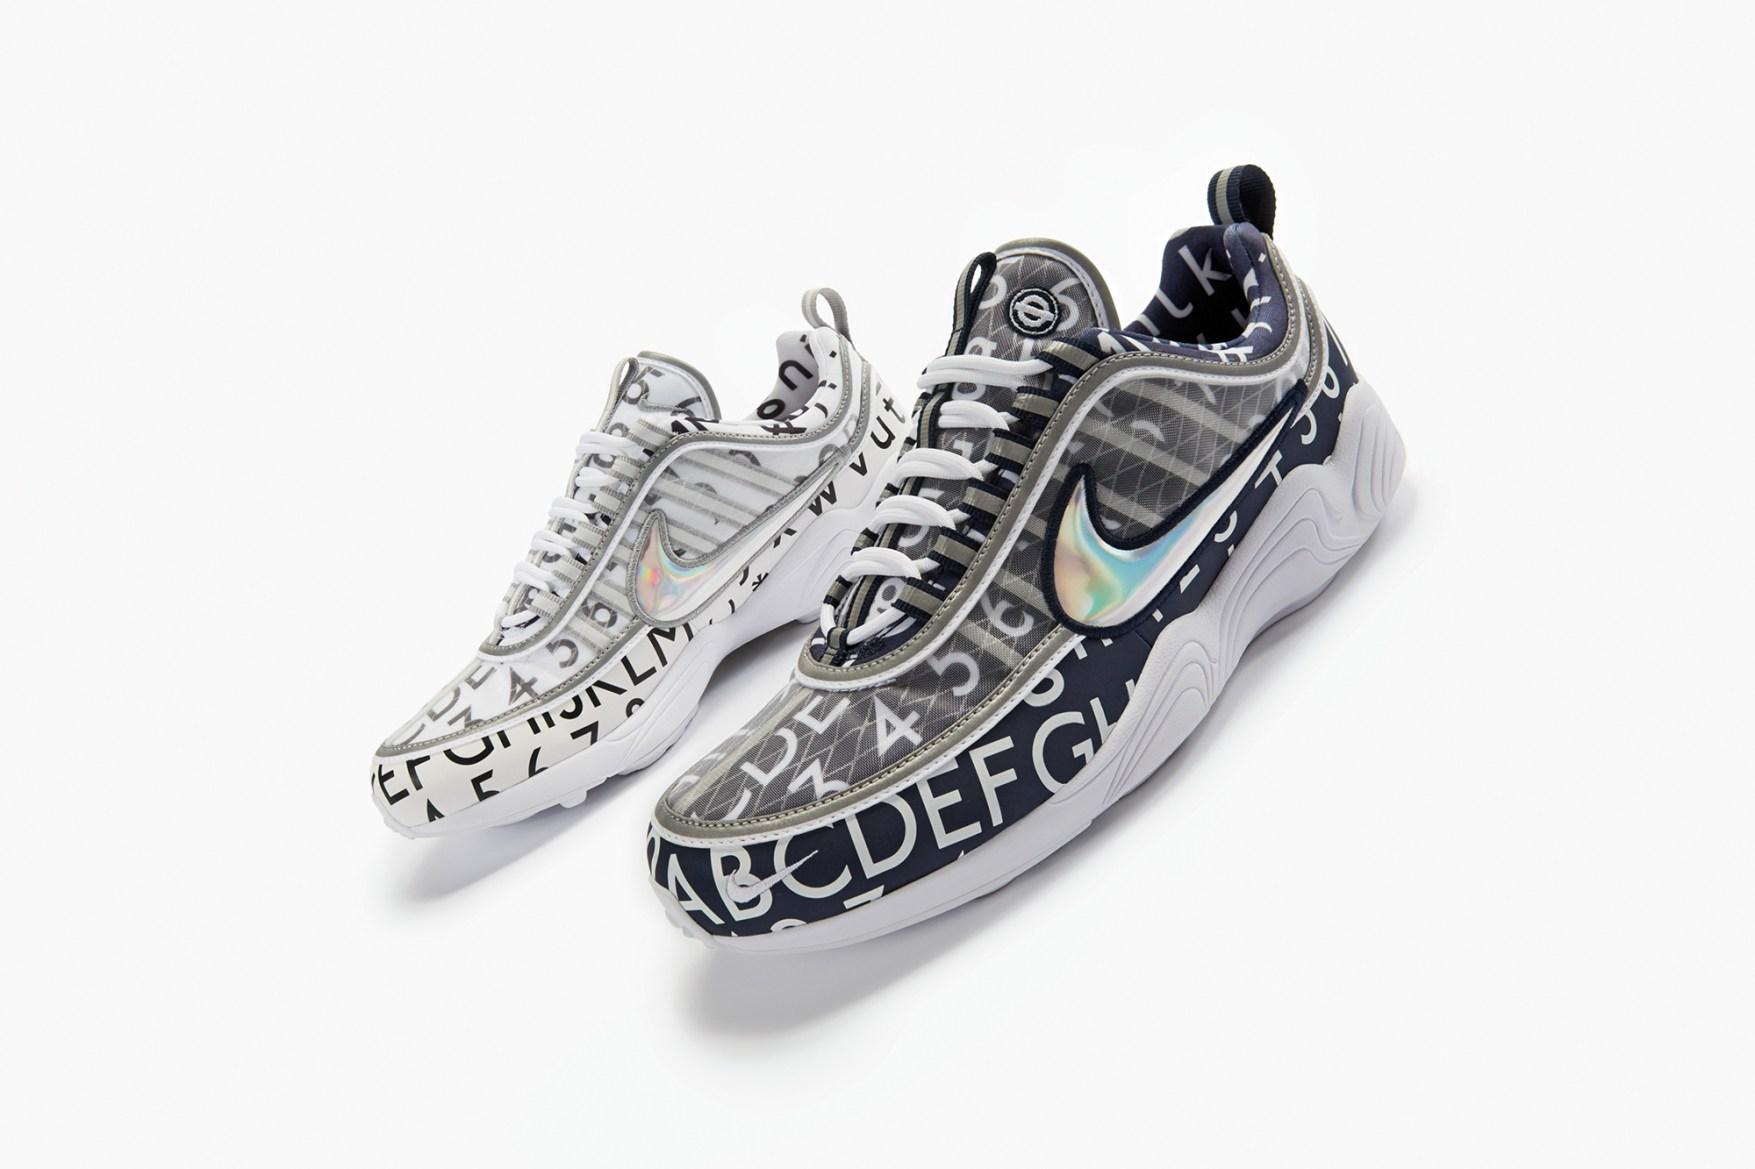 Nike Zoom Spiridon Roundel